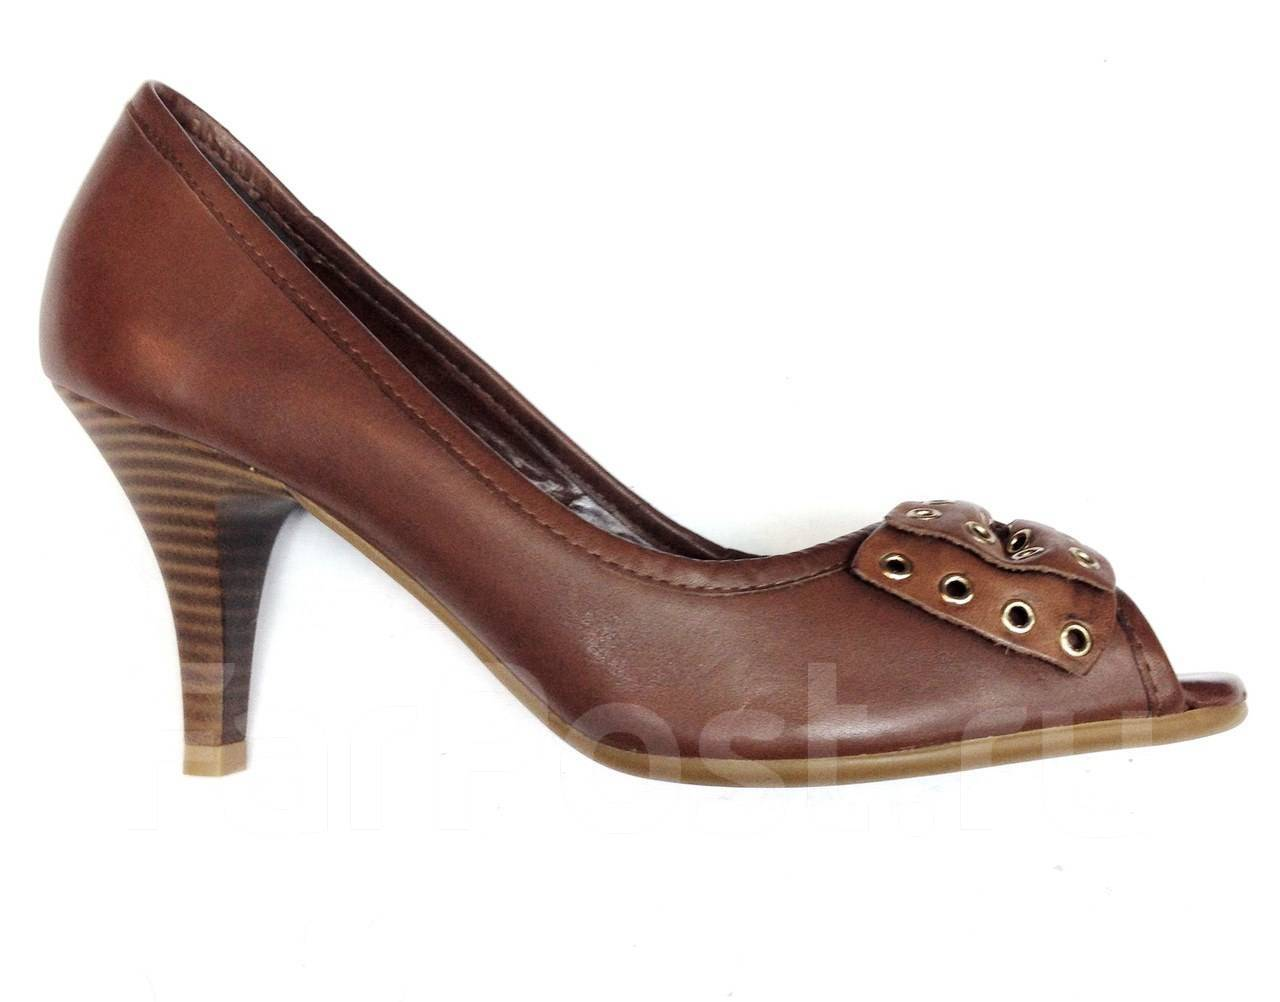 d13b2d59a Туфли Размер: 37 размера женские - купить в Хабаровске. Цены, фото.